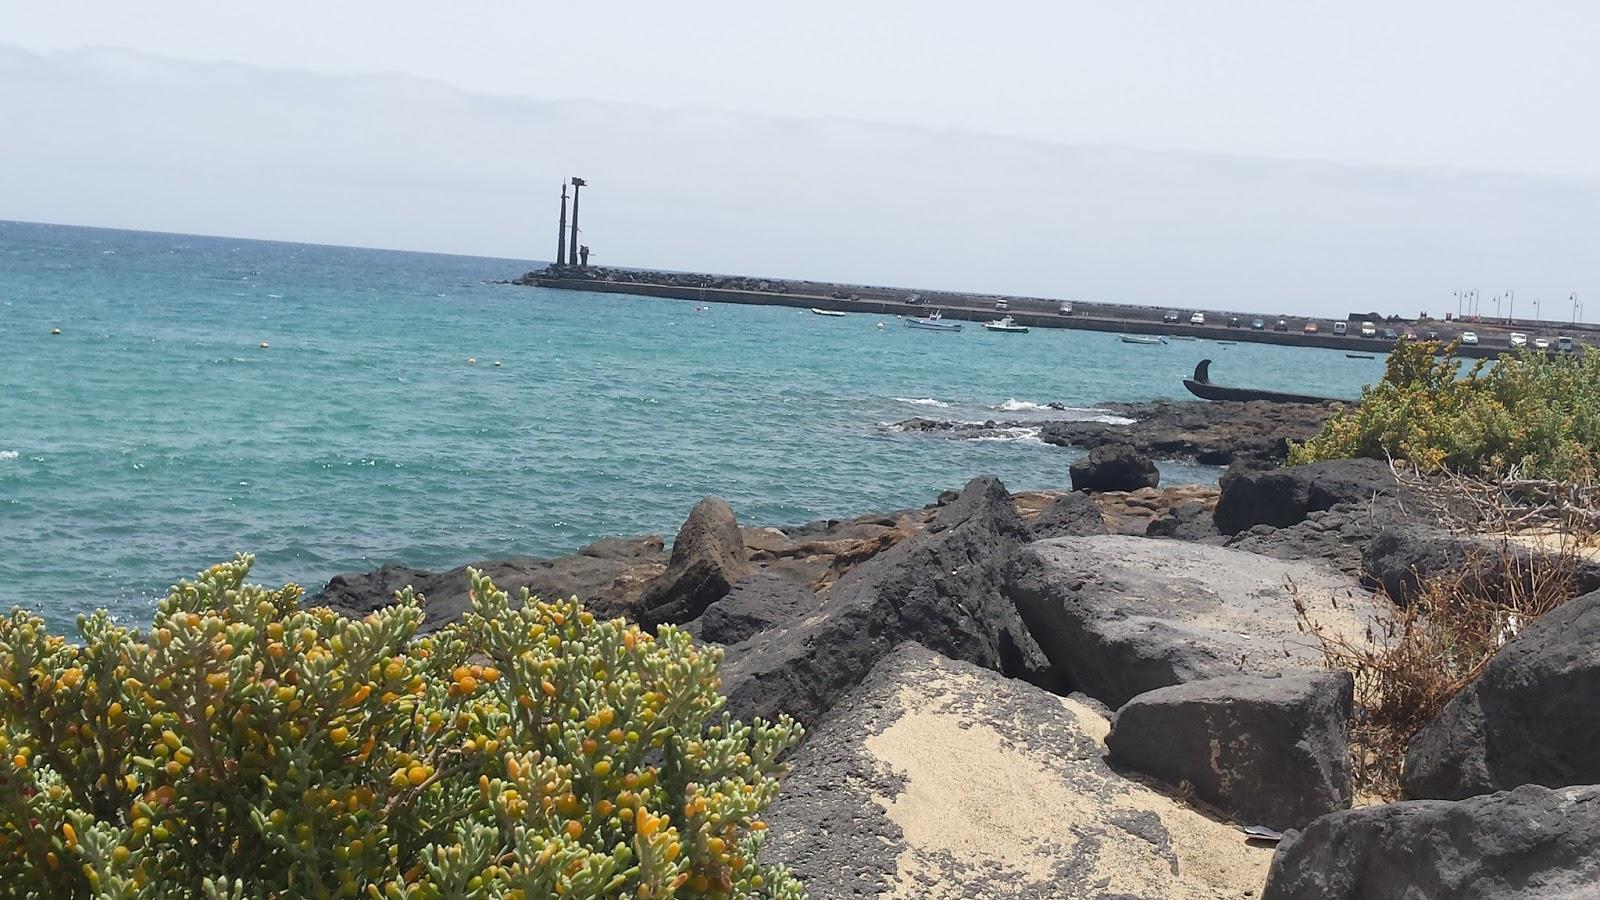 Costa Teguise, Lanzarote, Wyspy Kanaryjskie, Hiszpania, Spain, Espana, blog o Hiszpanii